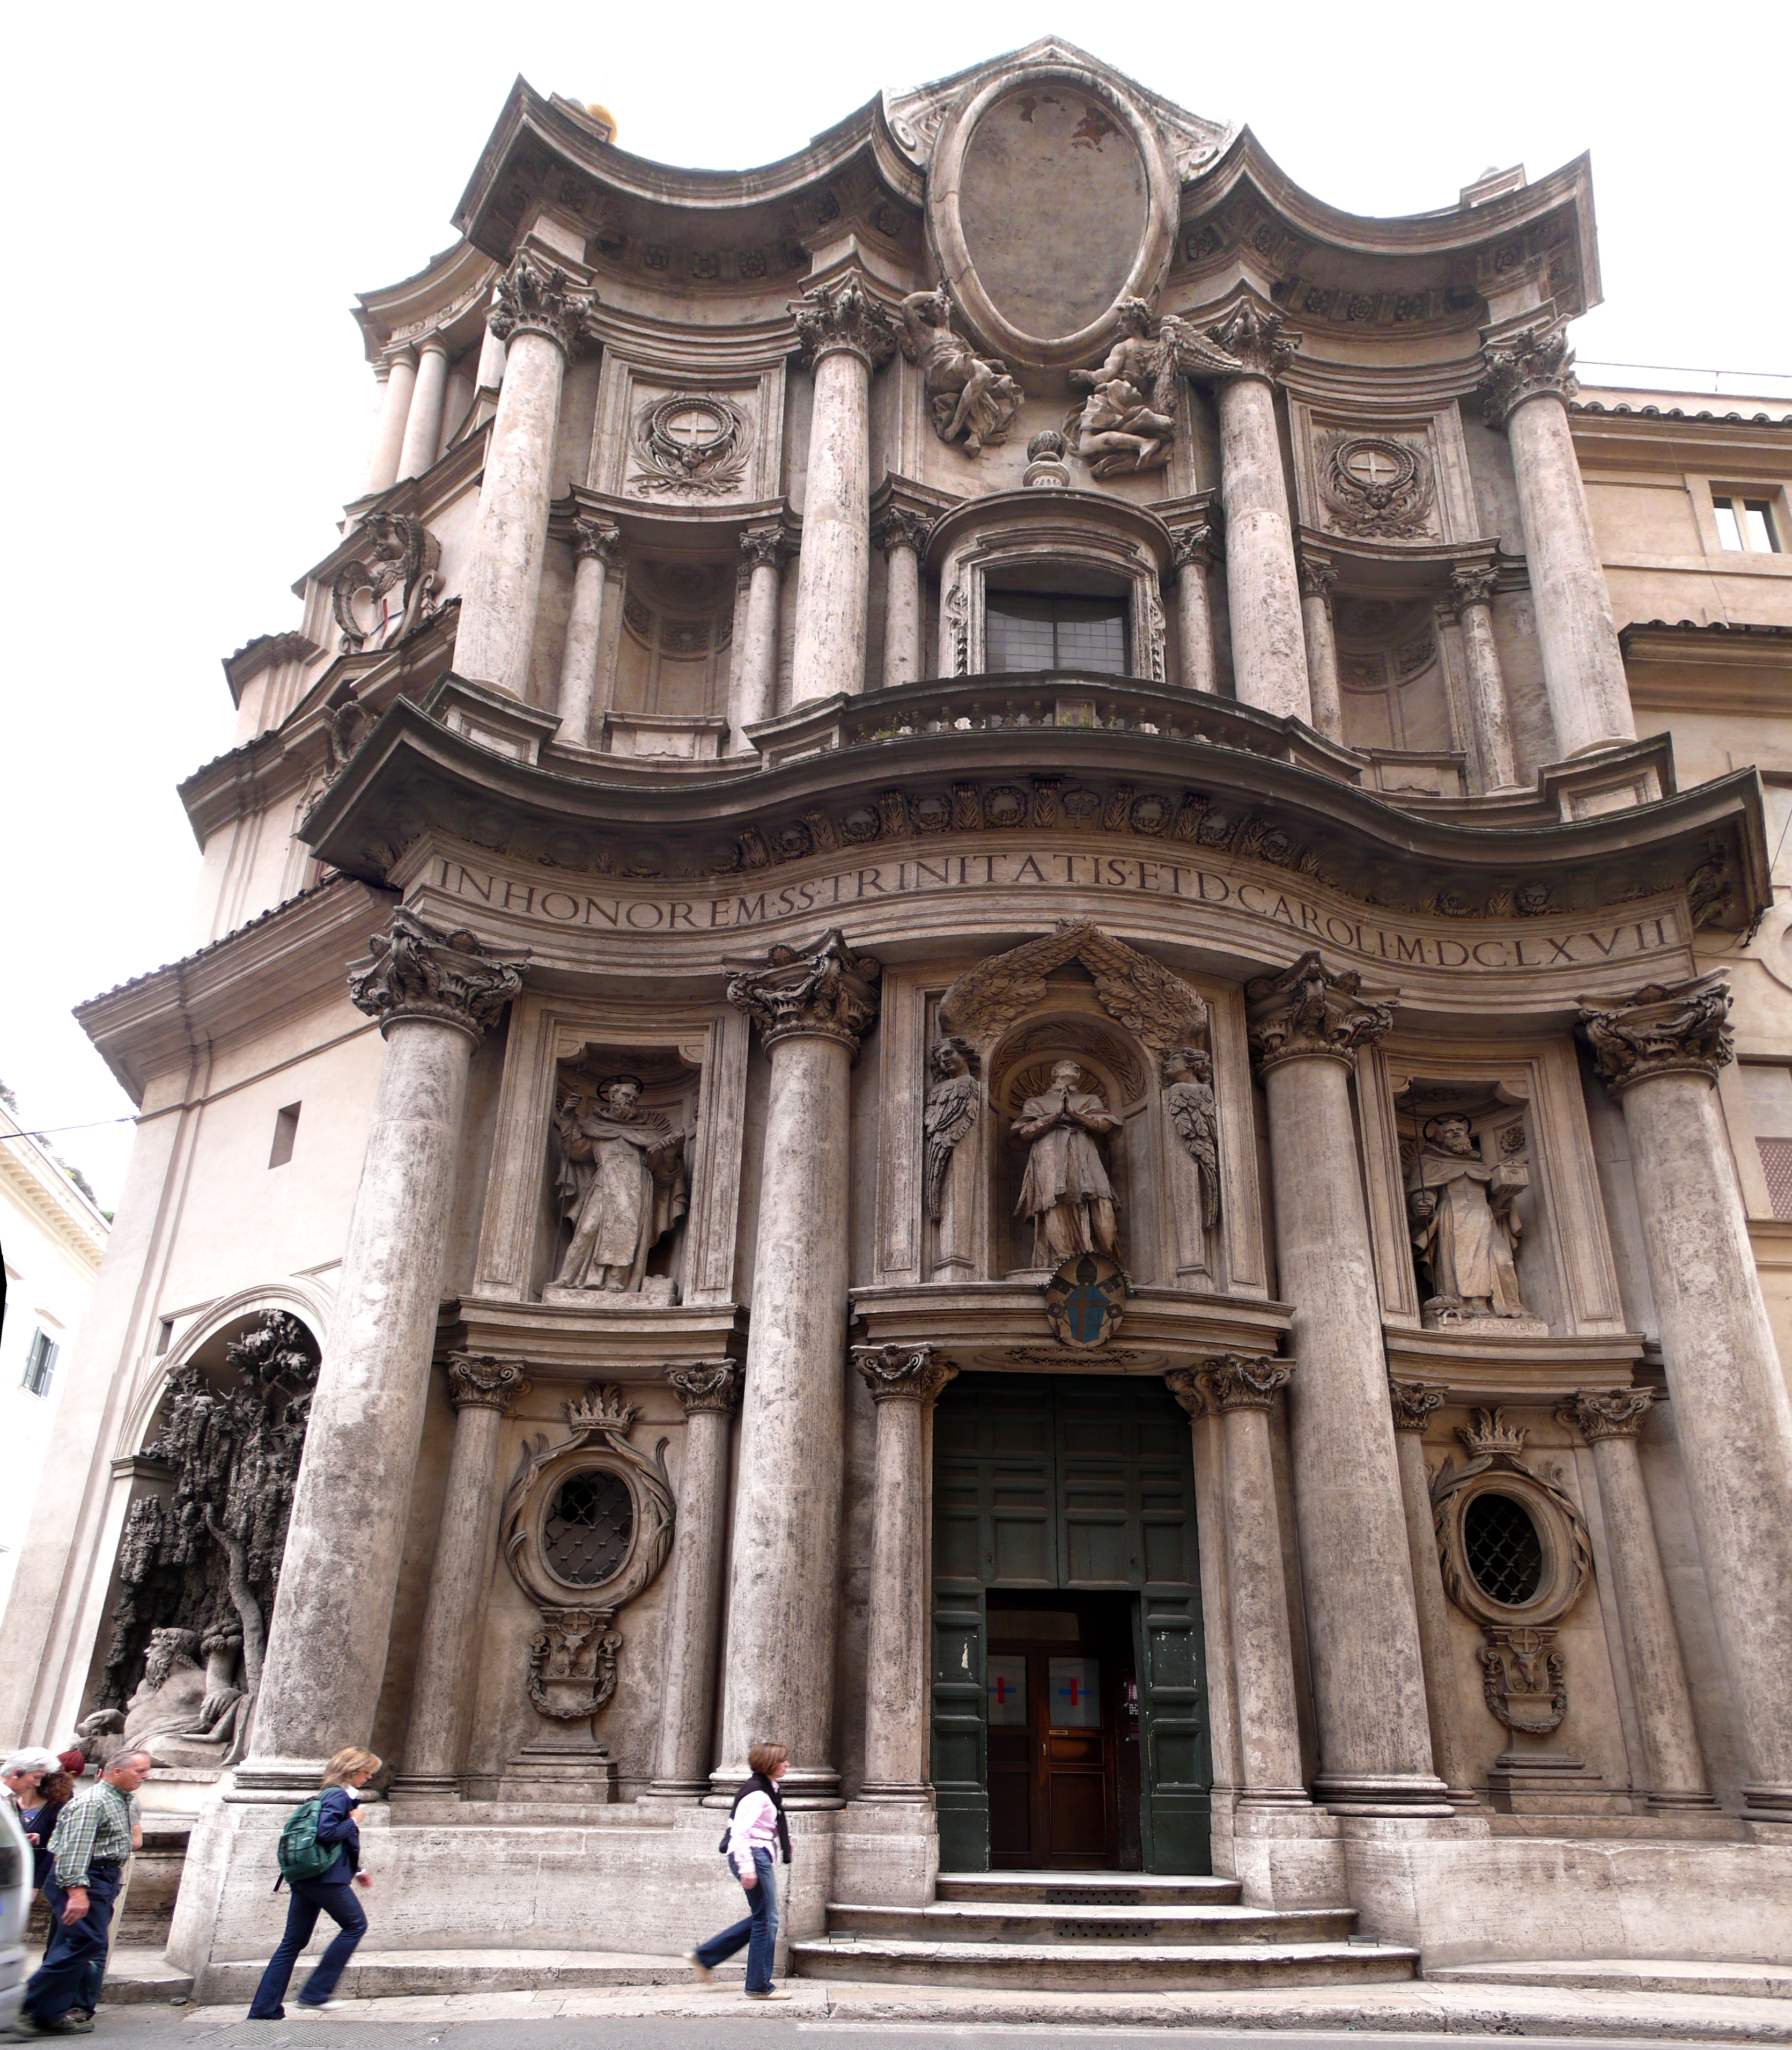 Estilos artisticos barroco neoclasico modernismo Romanticismo arquitectura